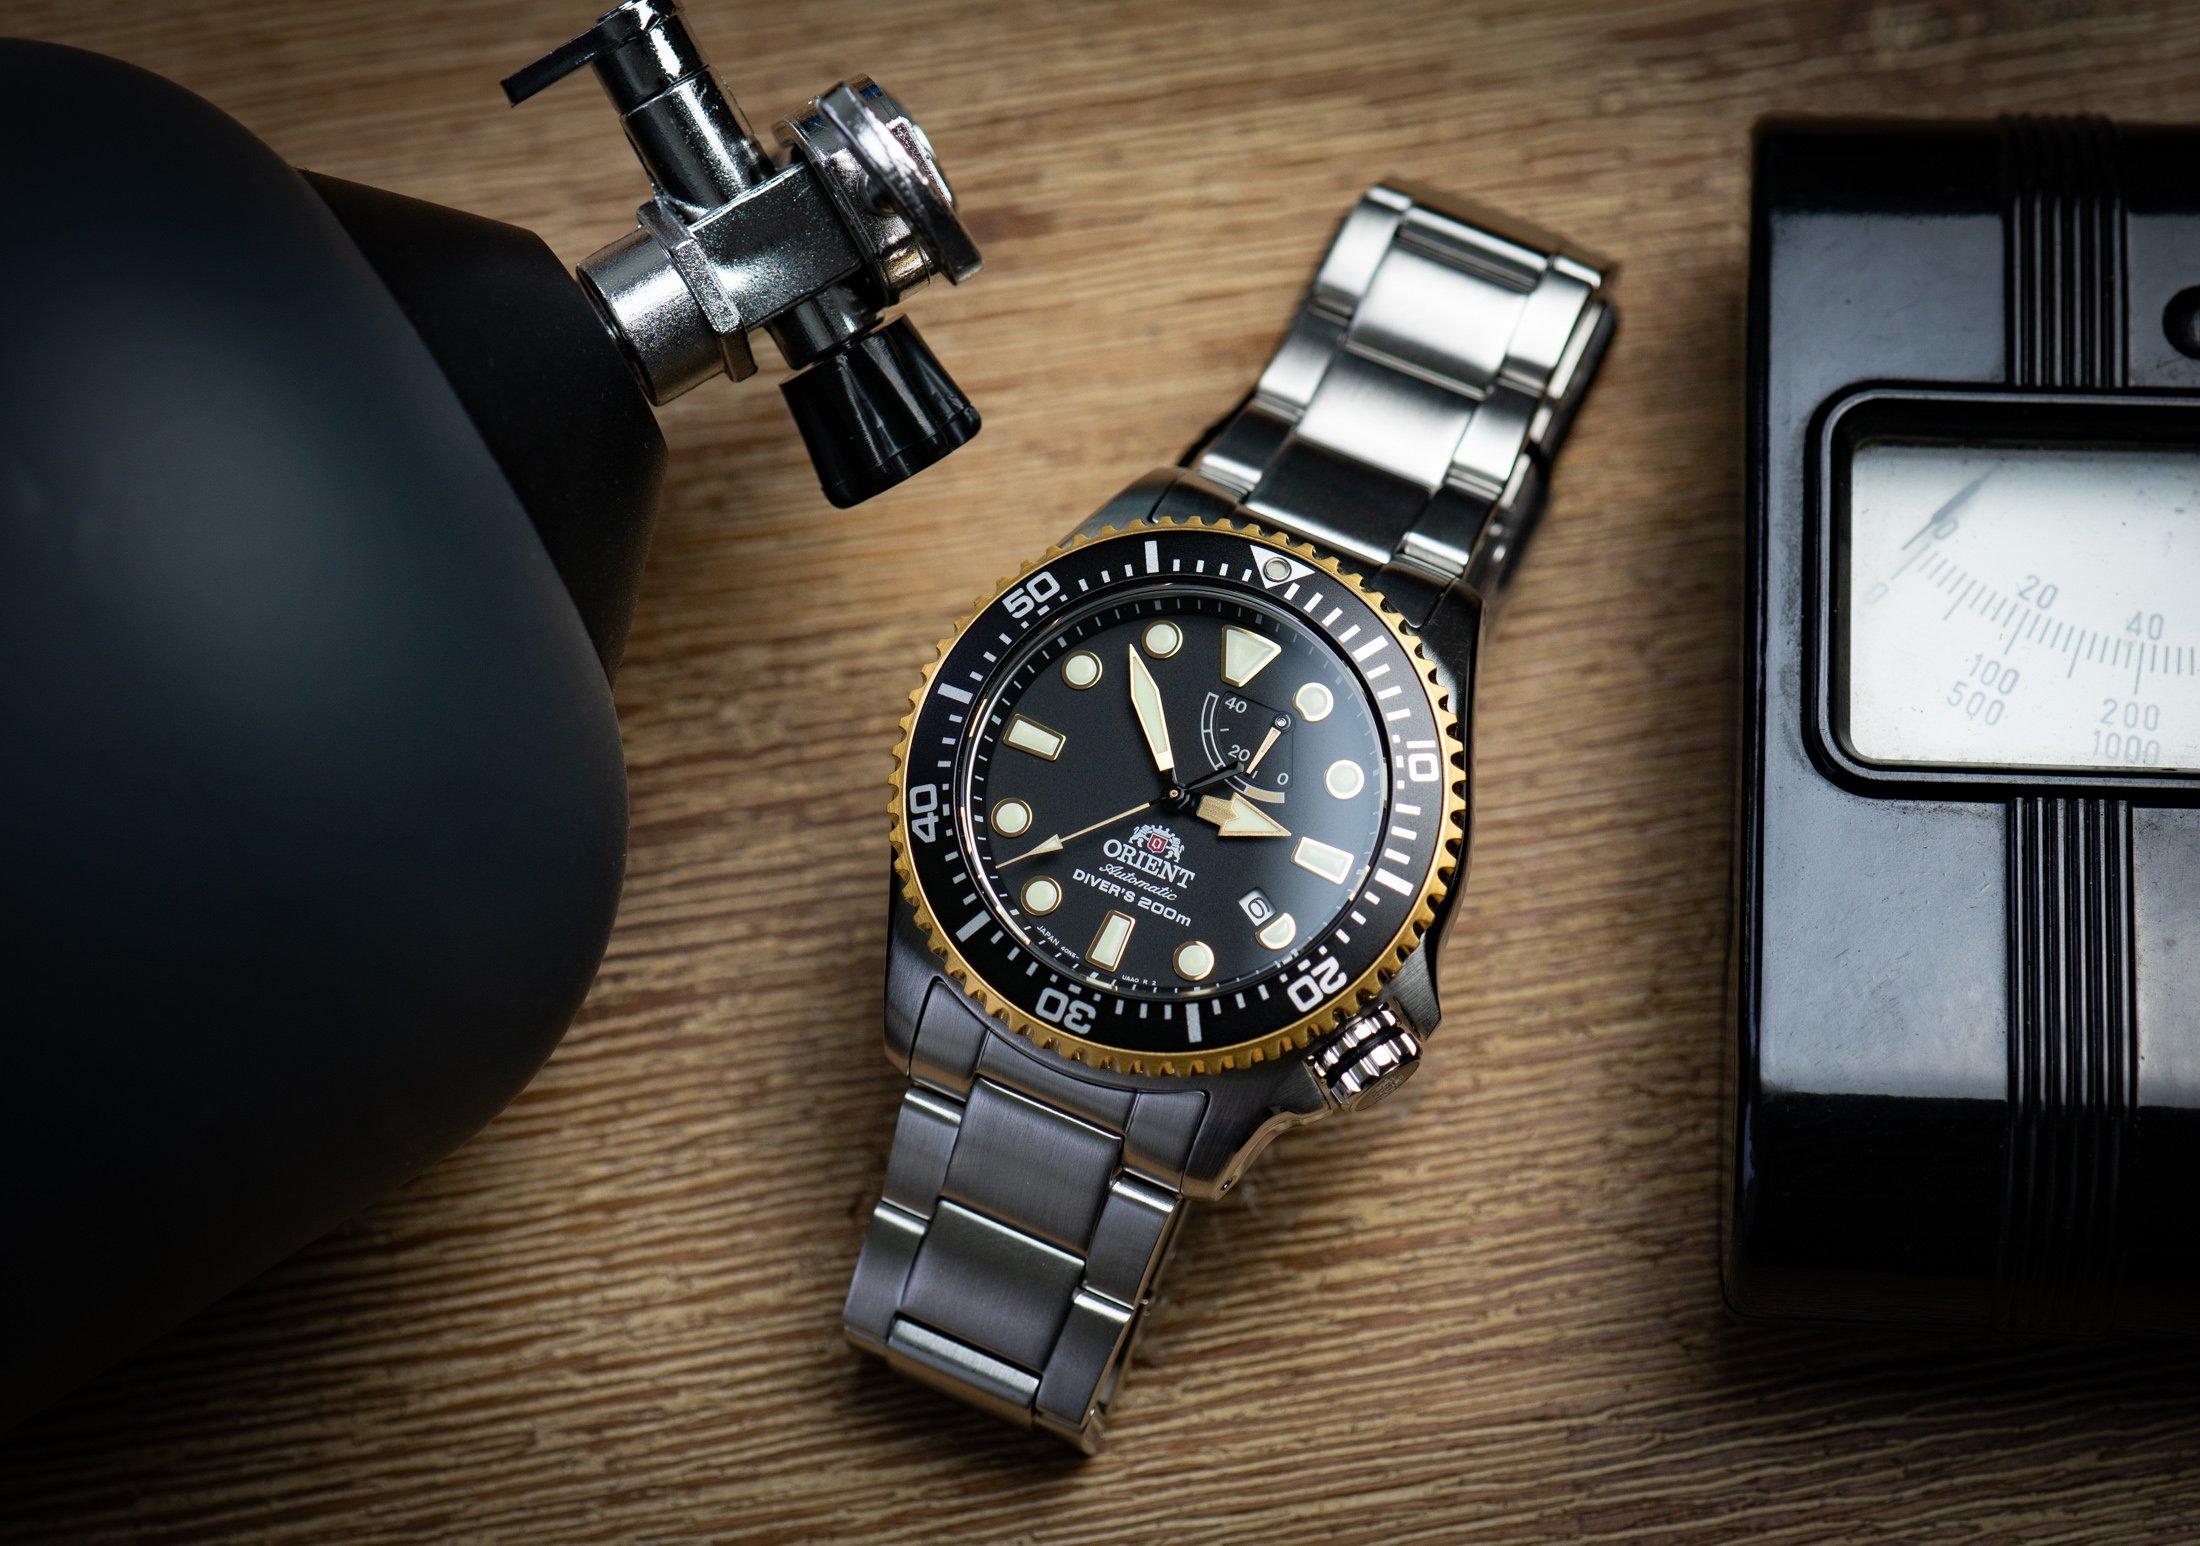 Orient-Uhren-Test-Herren-Analog-Automatik-Uhr-mit-Edelstahl-Armband-RA-EL0003B00B